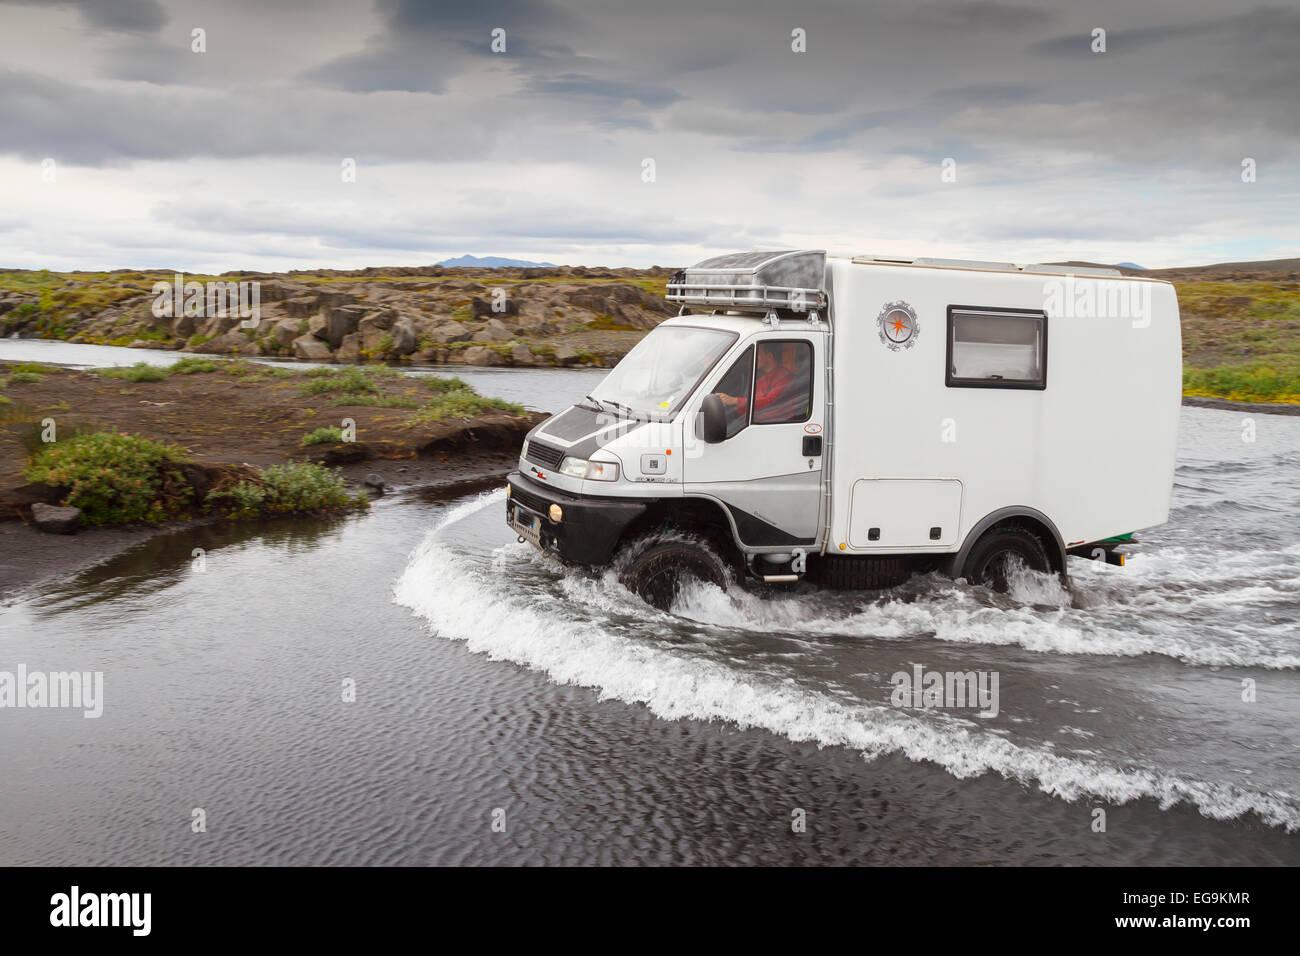 Van fording a river. Askja caldera route. Central Highlands. Iceland, Europe. - Stock Image